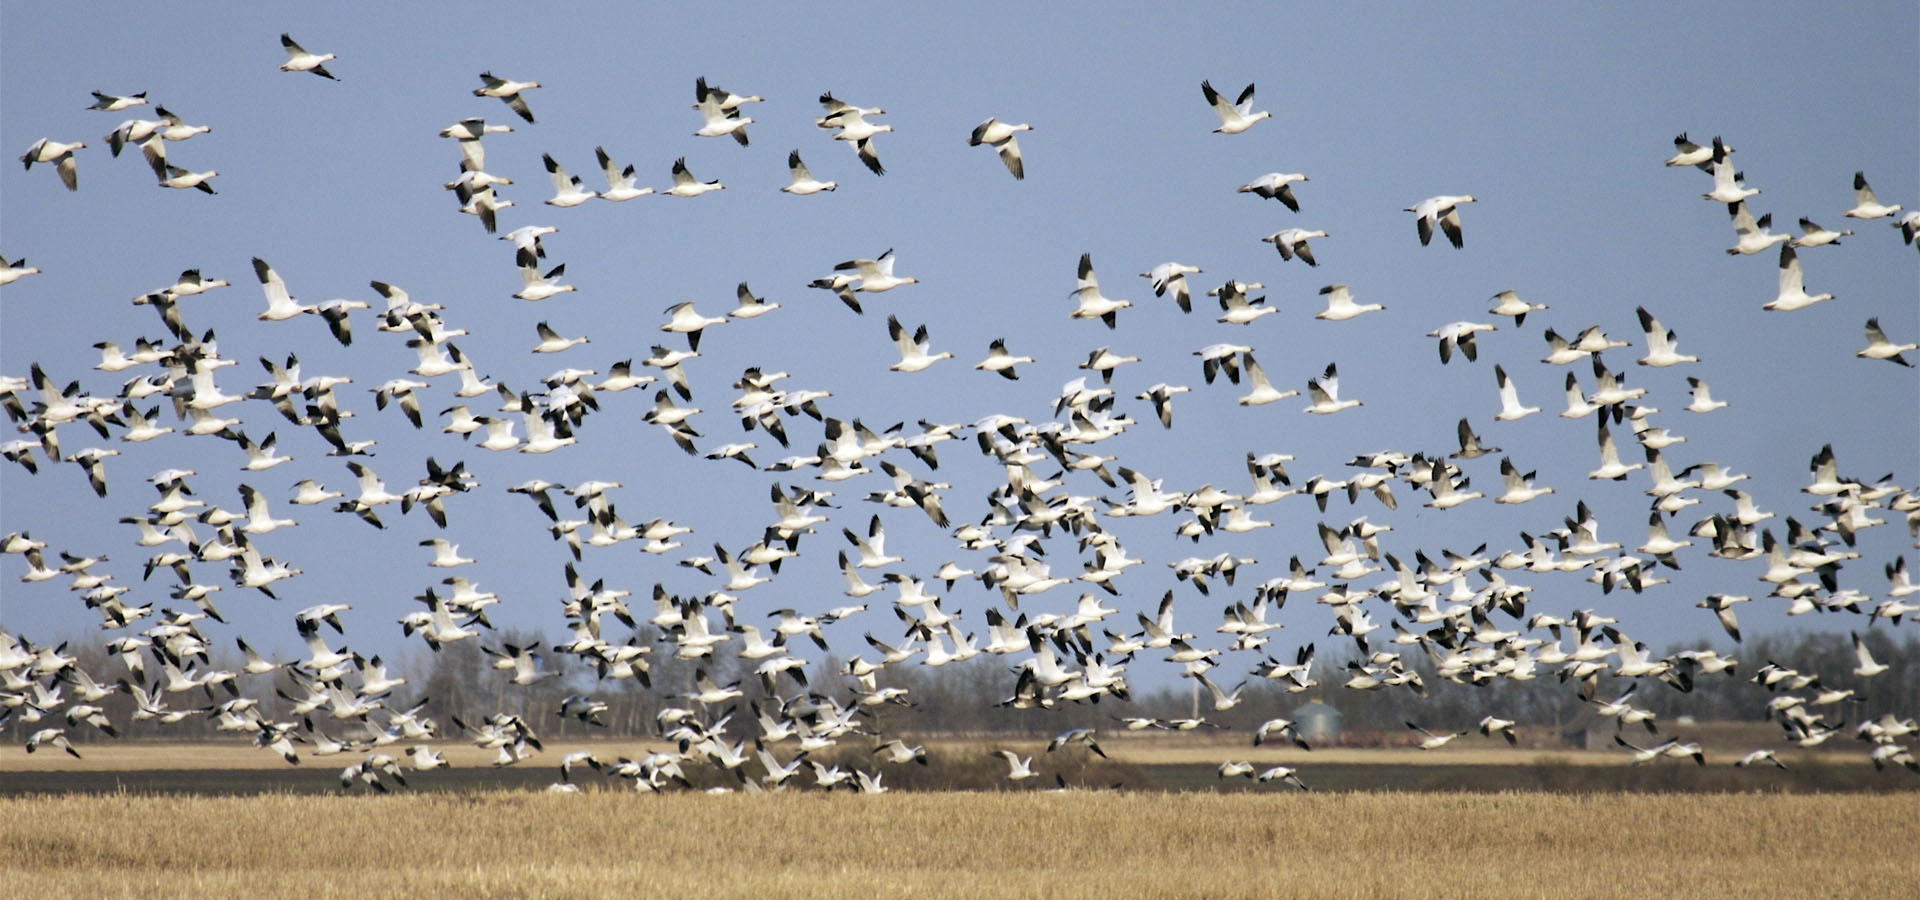 Snow Goose Hunting Canada